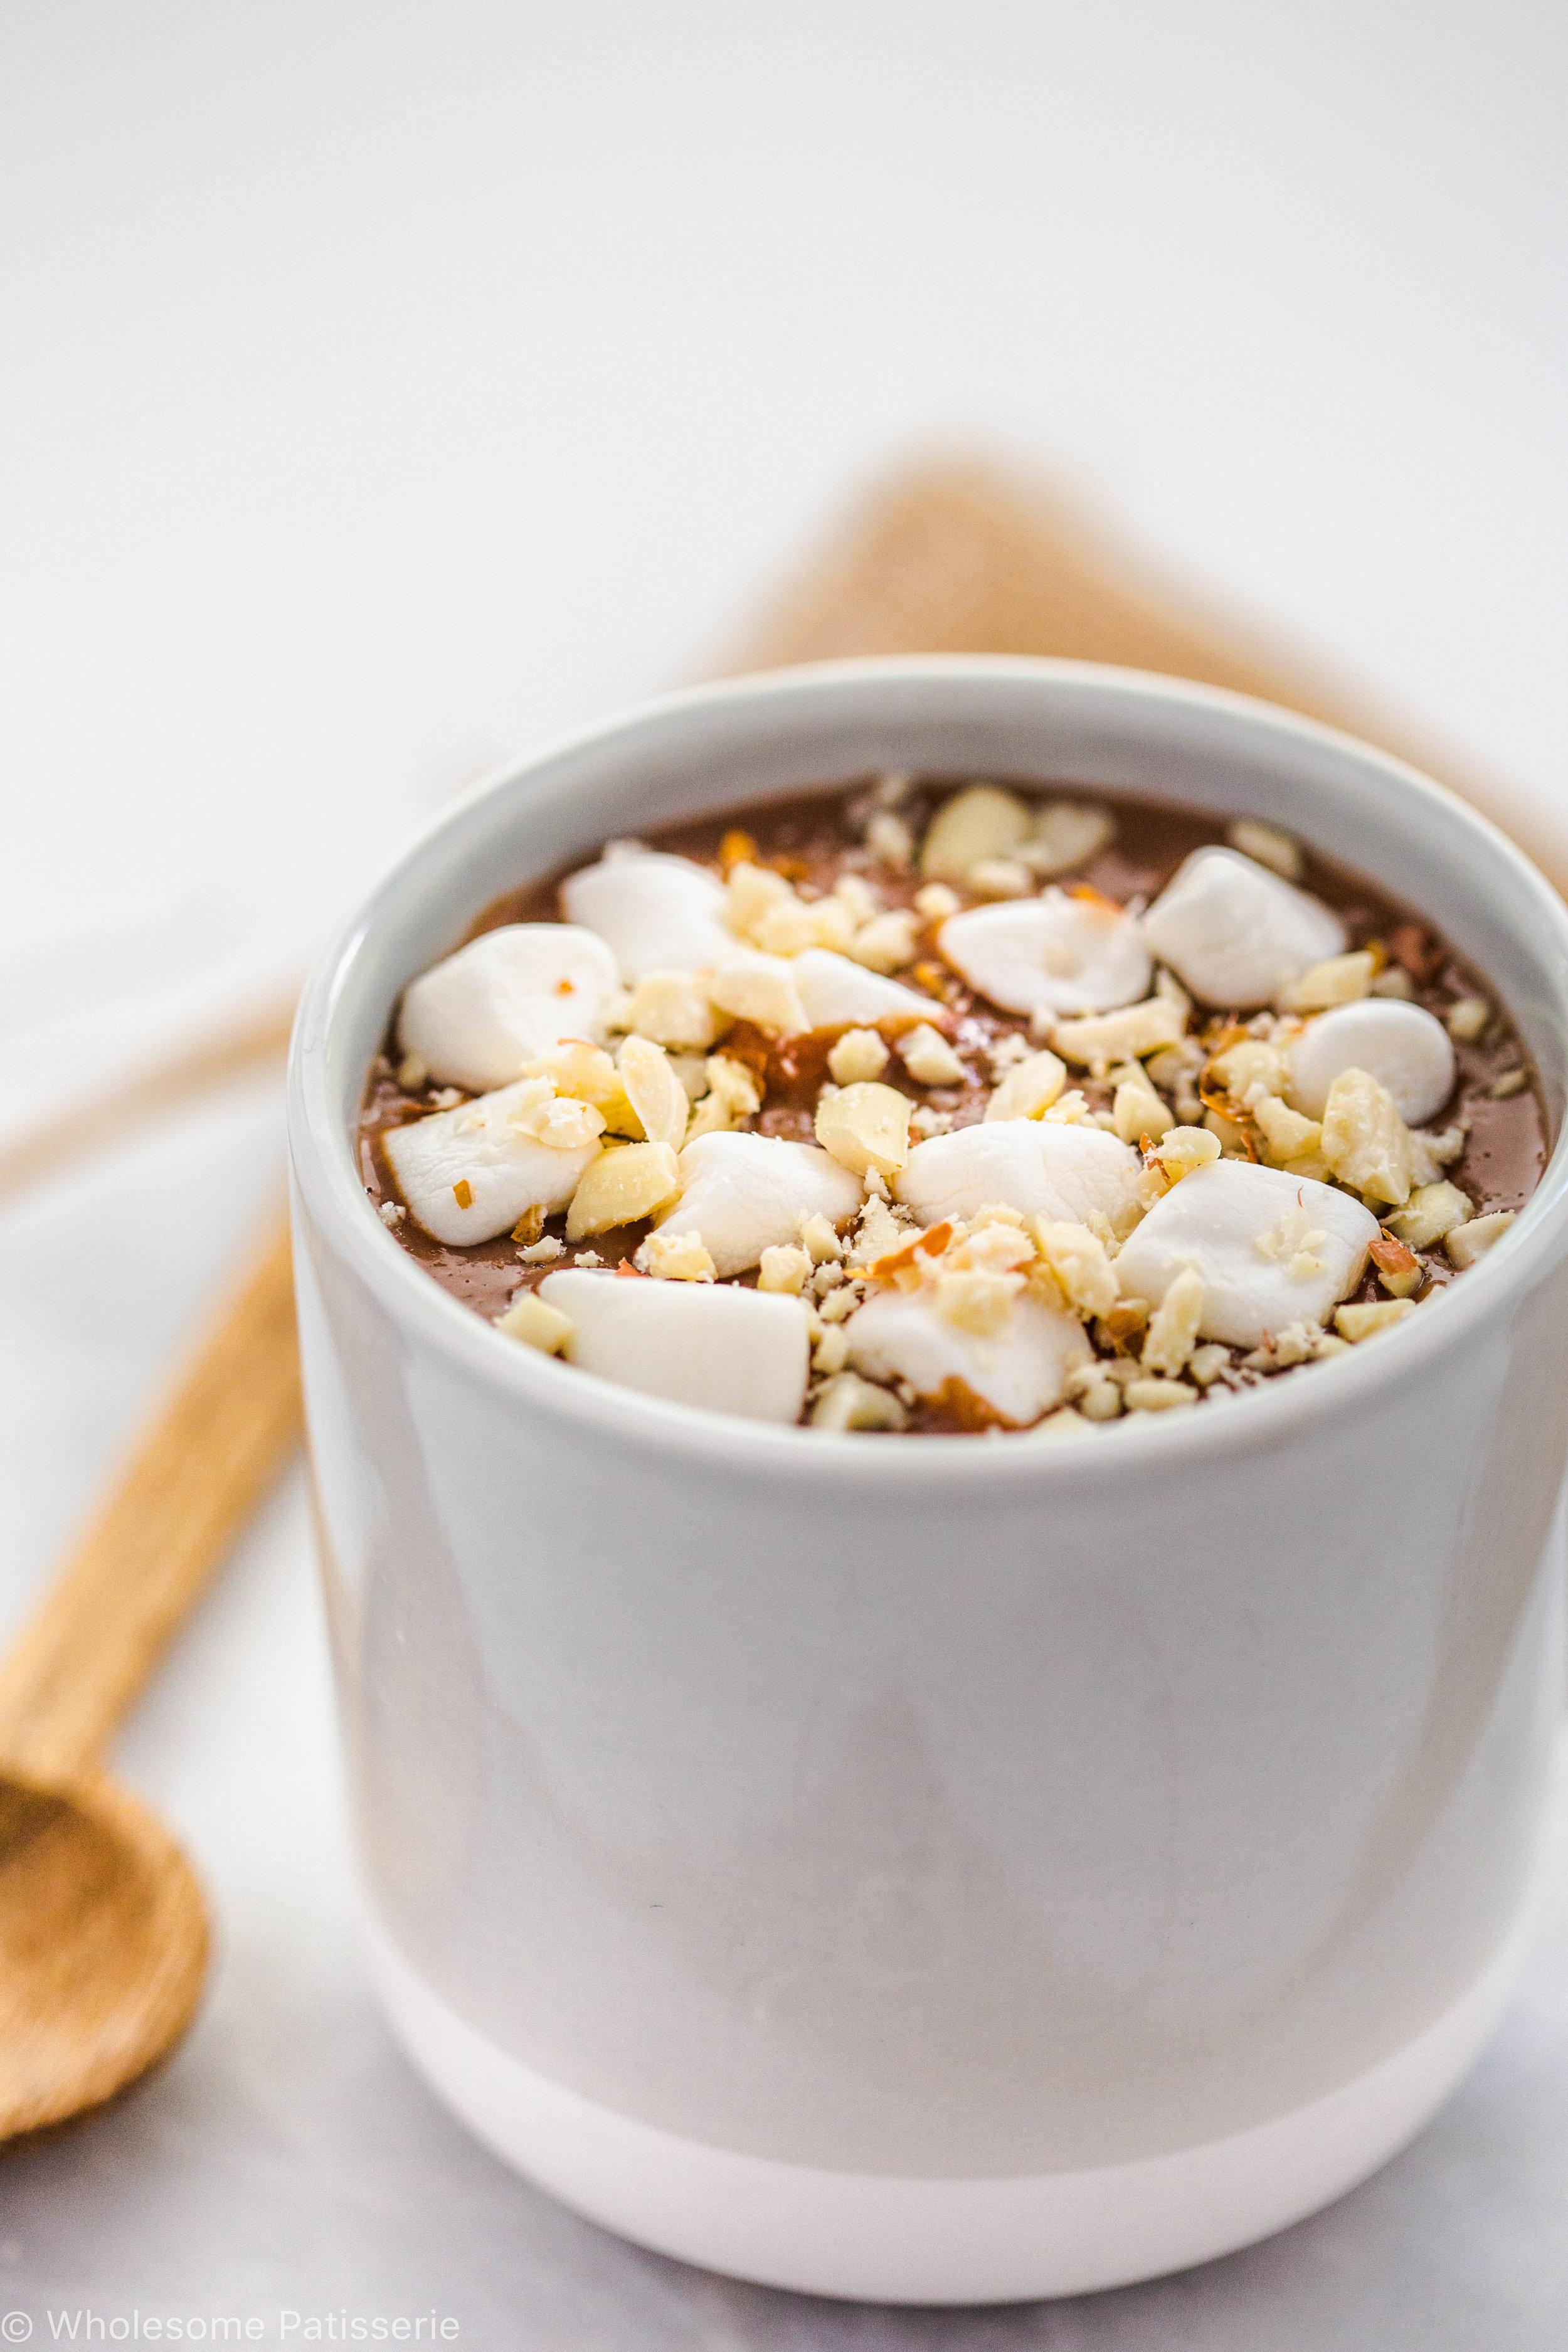 peanut-butter-hot-chocolate-vegan-dairy-free-gluten-free-mayvers-beverage-peanuts.jpg